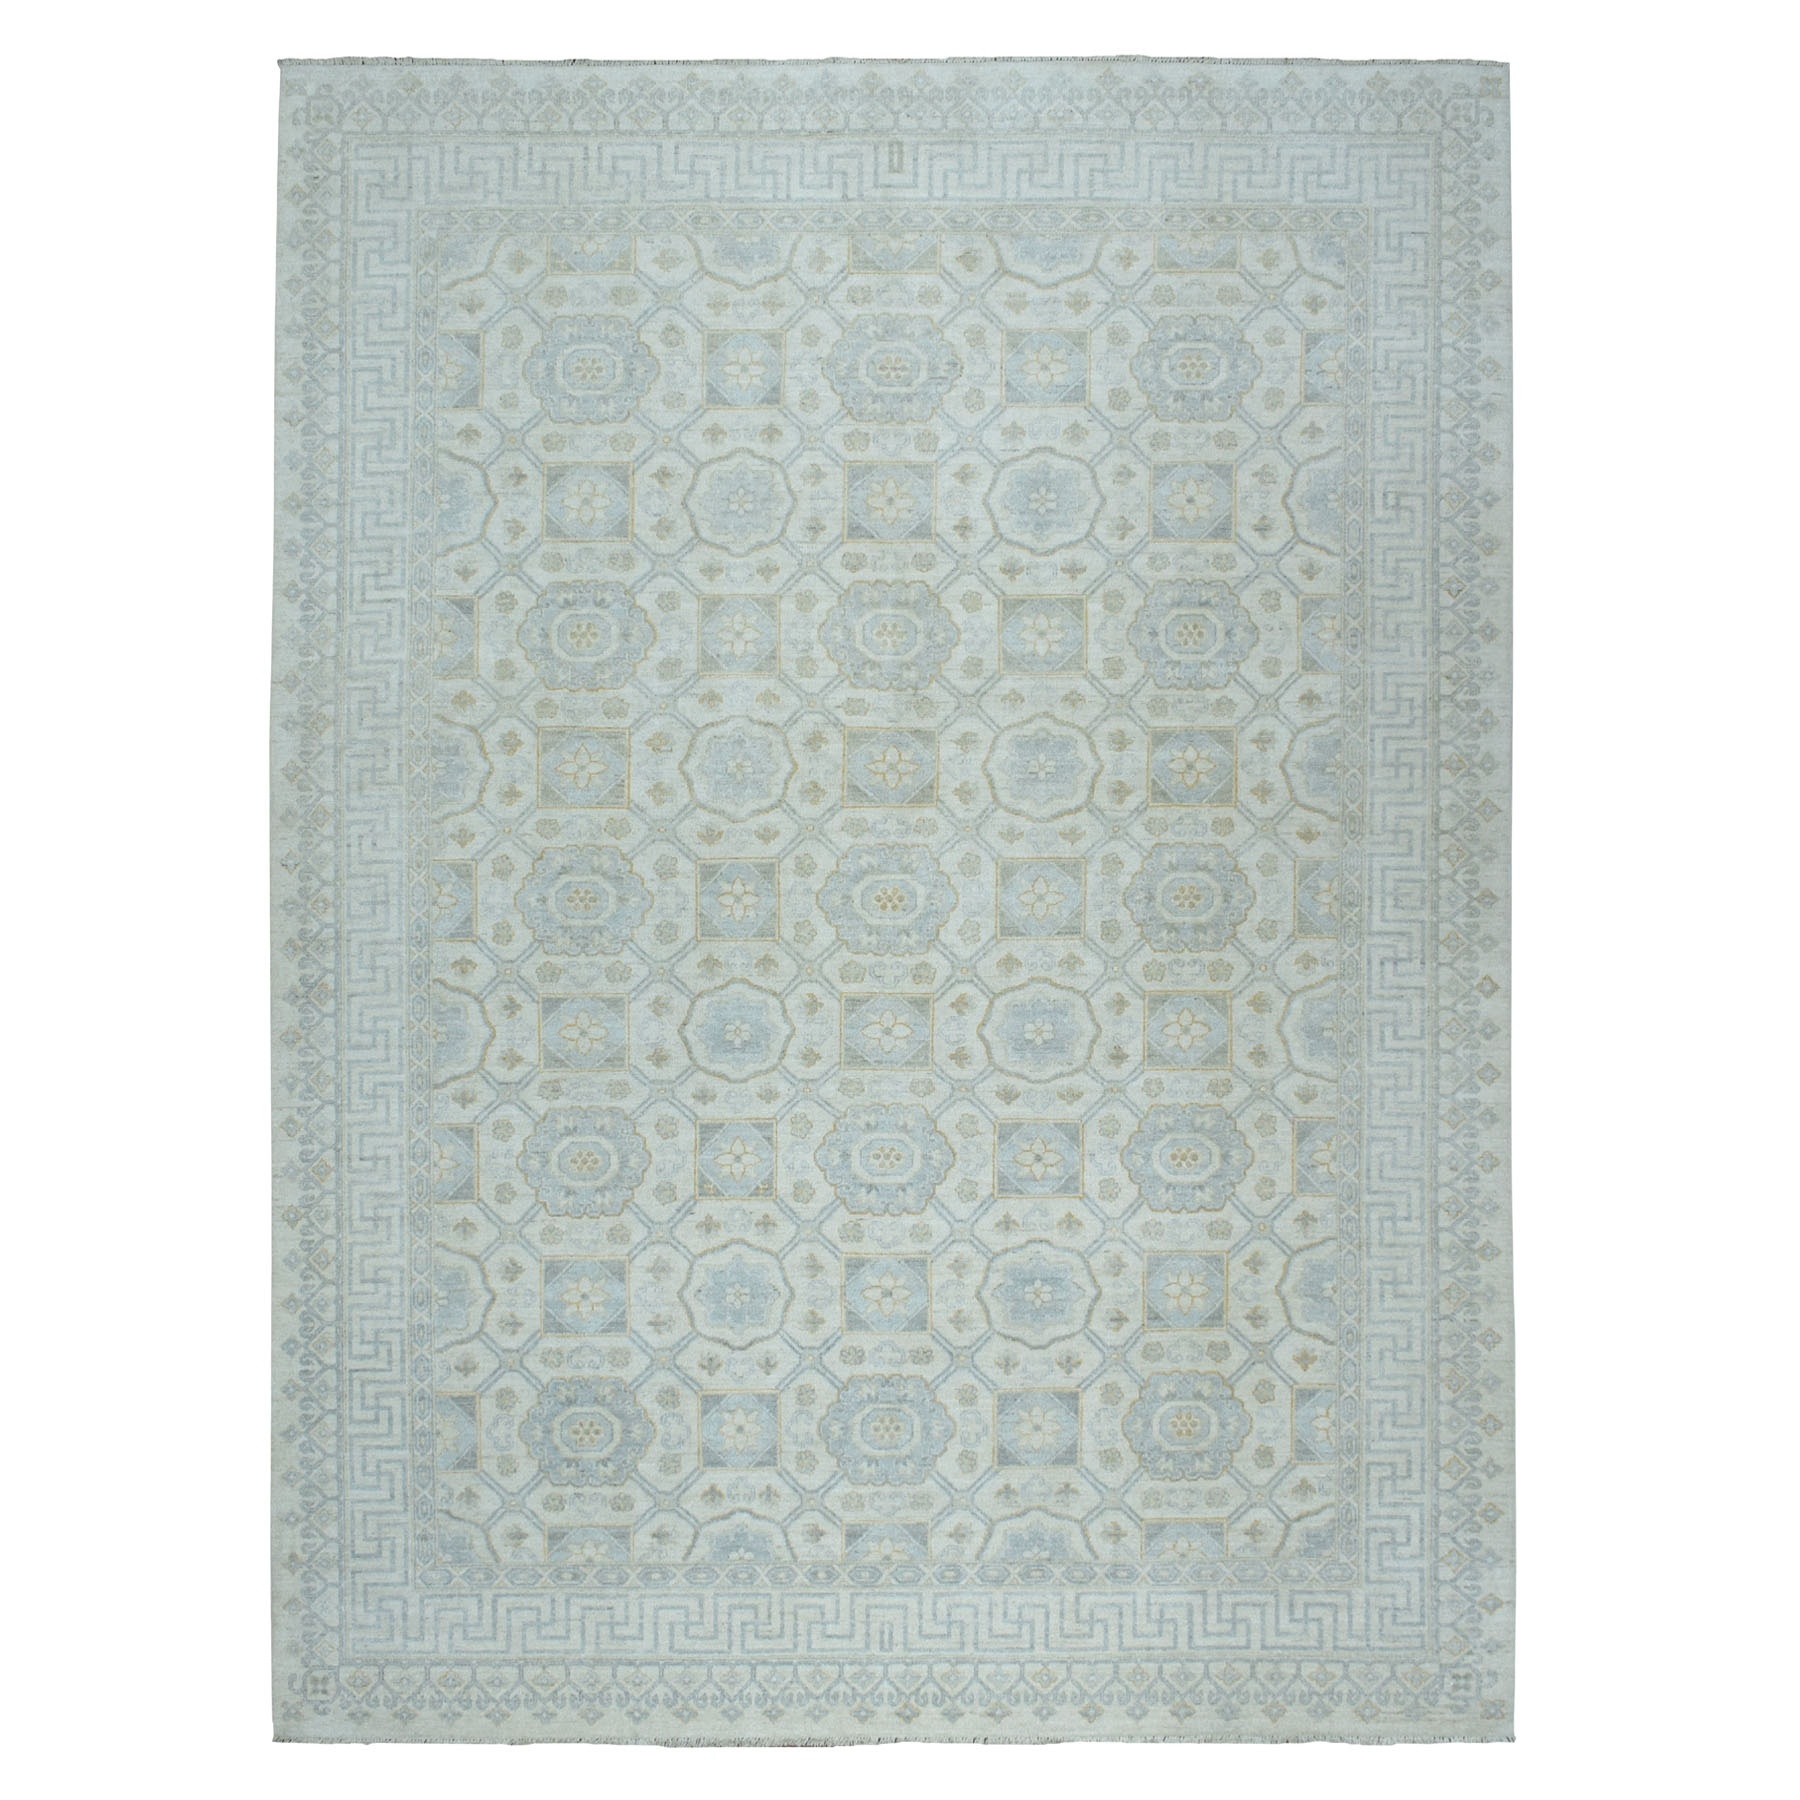 "9'X11'8"" White Wash Peshawar Khotan Hand-Knotted Pure Wool Oriental Rug moaeaa70"